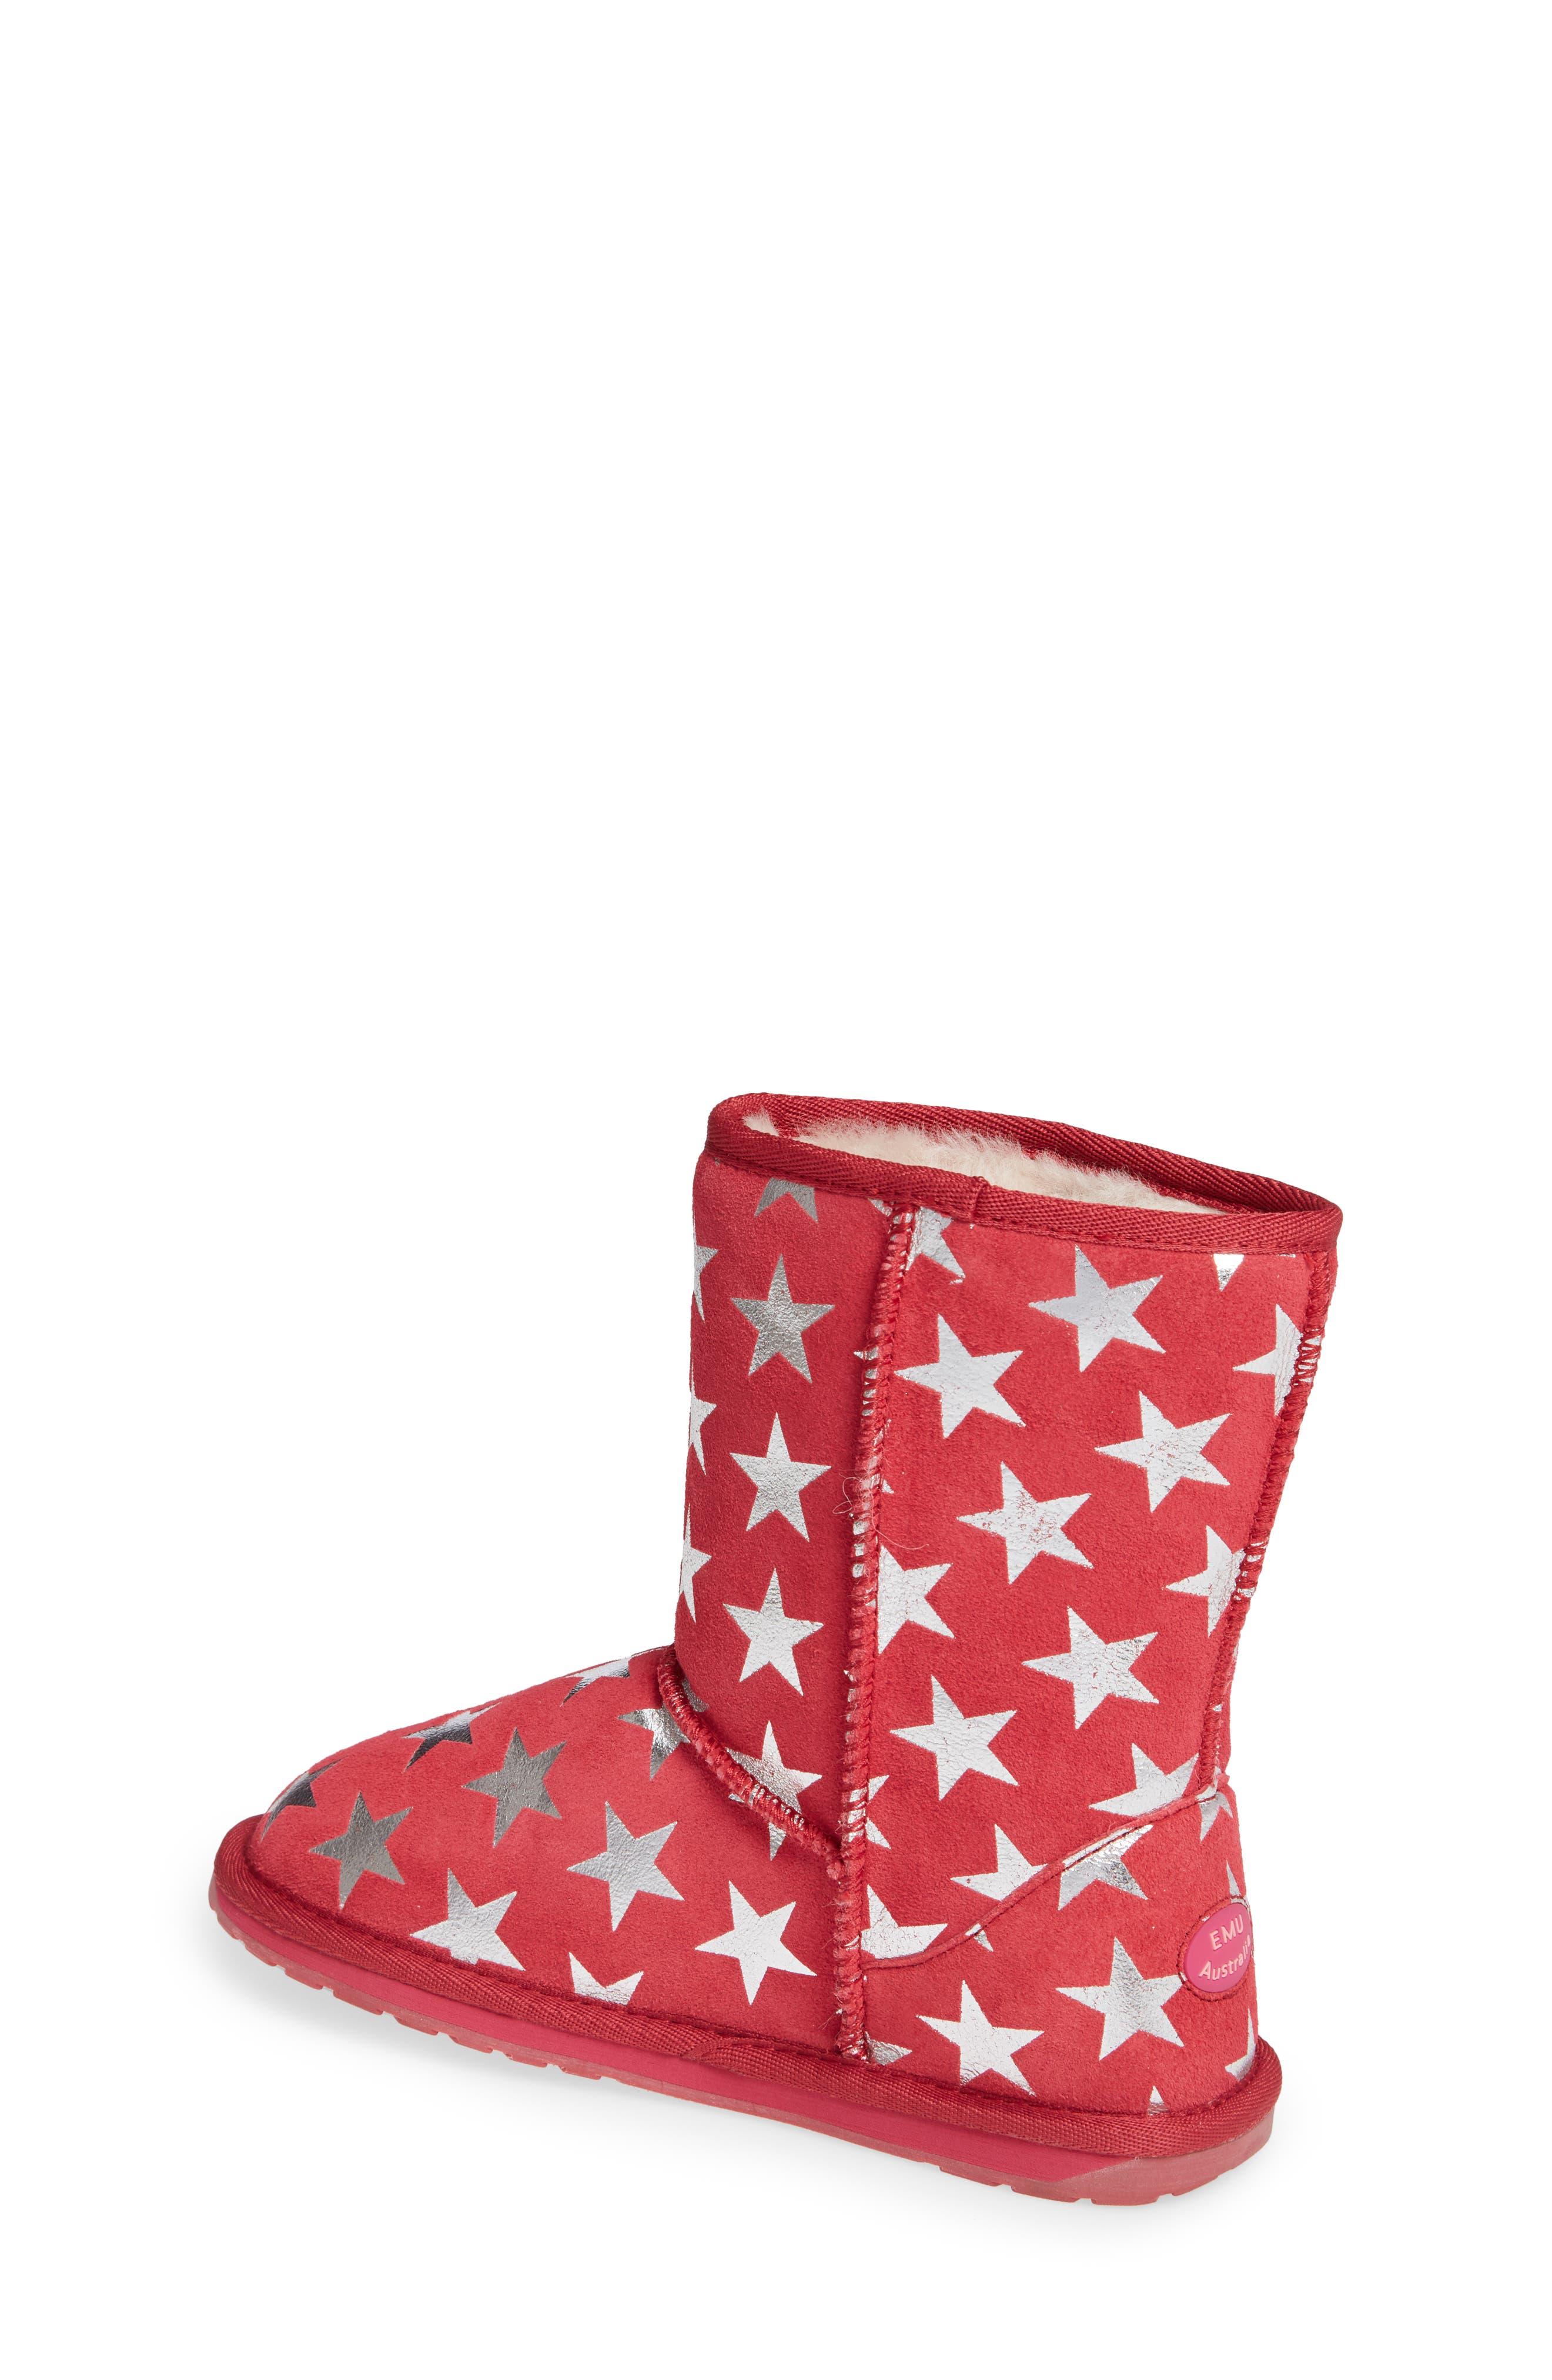 EMUAustralia Starry Night Boot,                             Alternate thumbnail 2, color,                             Fuchsia